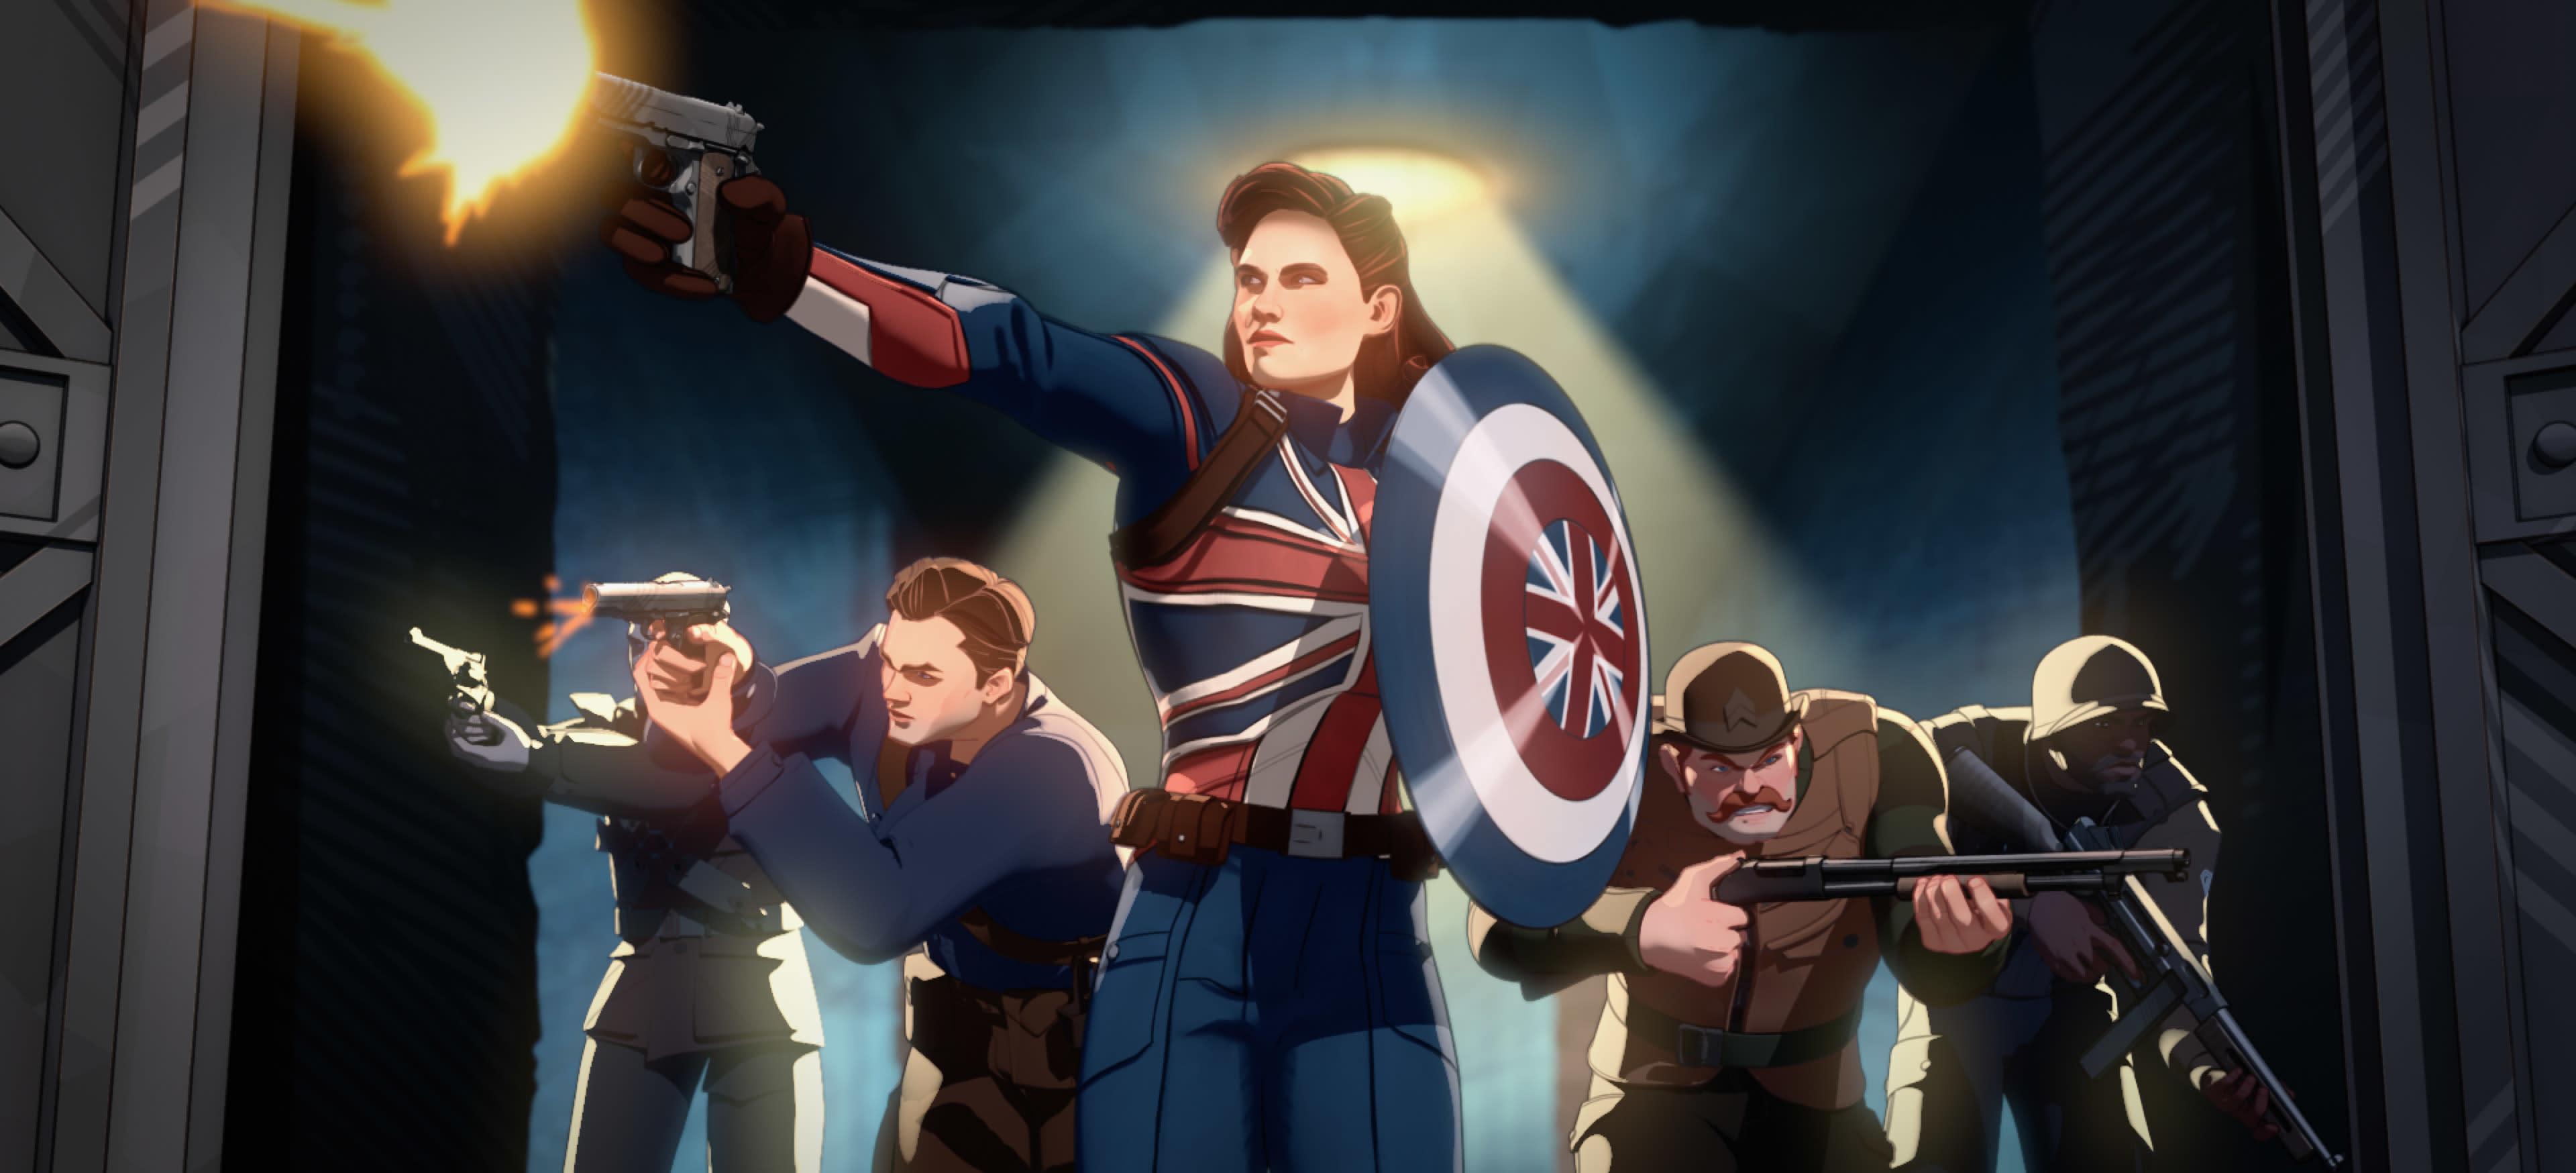 Captain Carter and the Howling Commandos